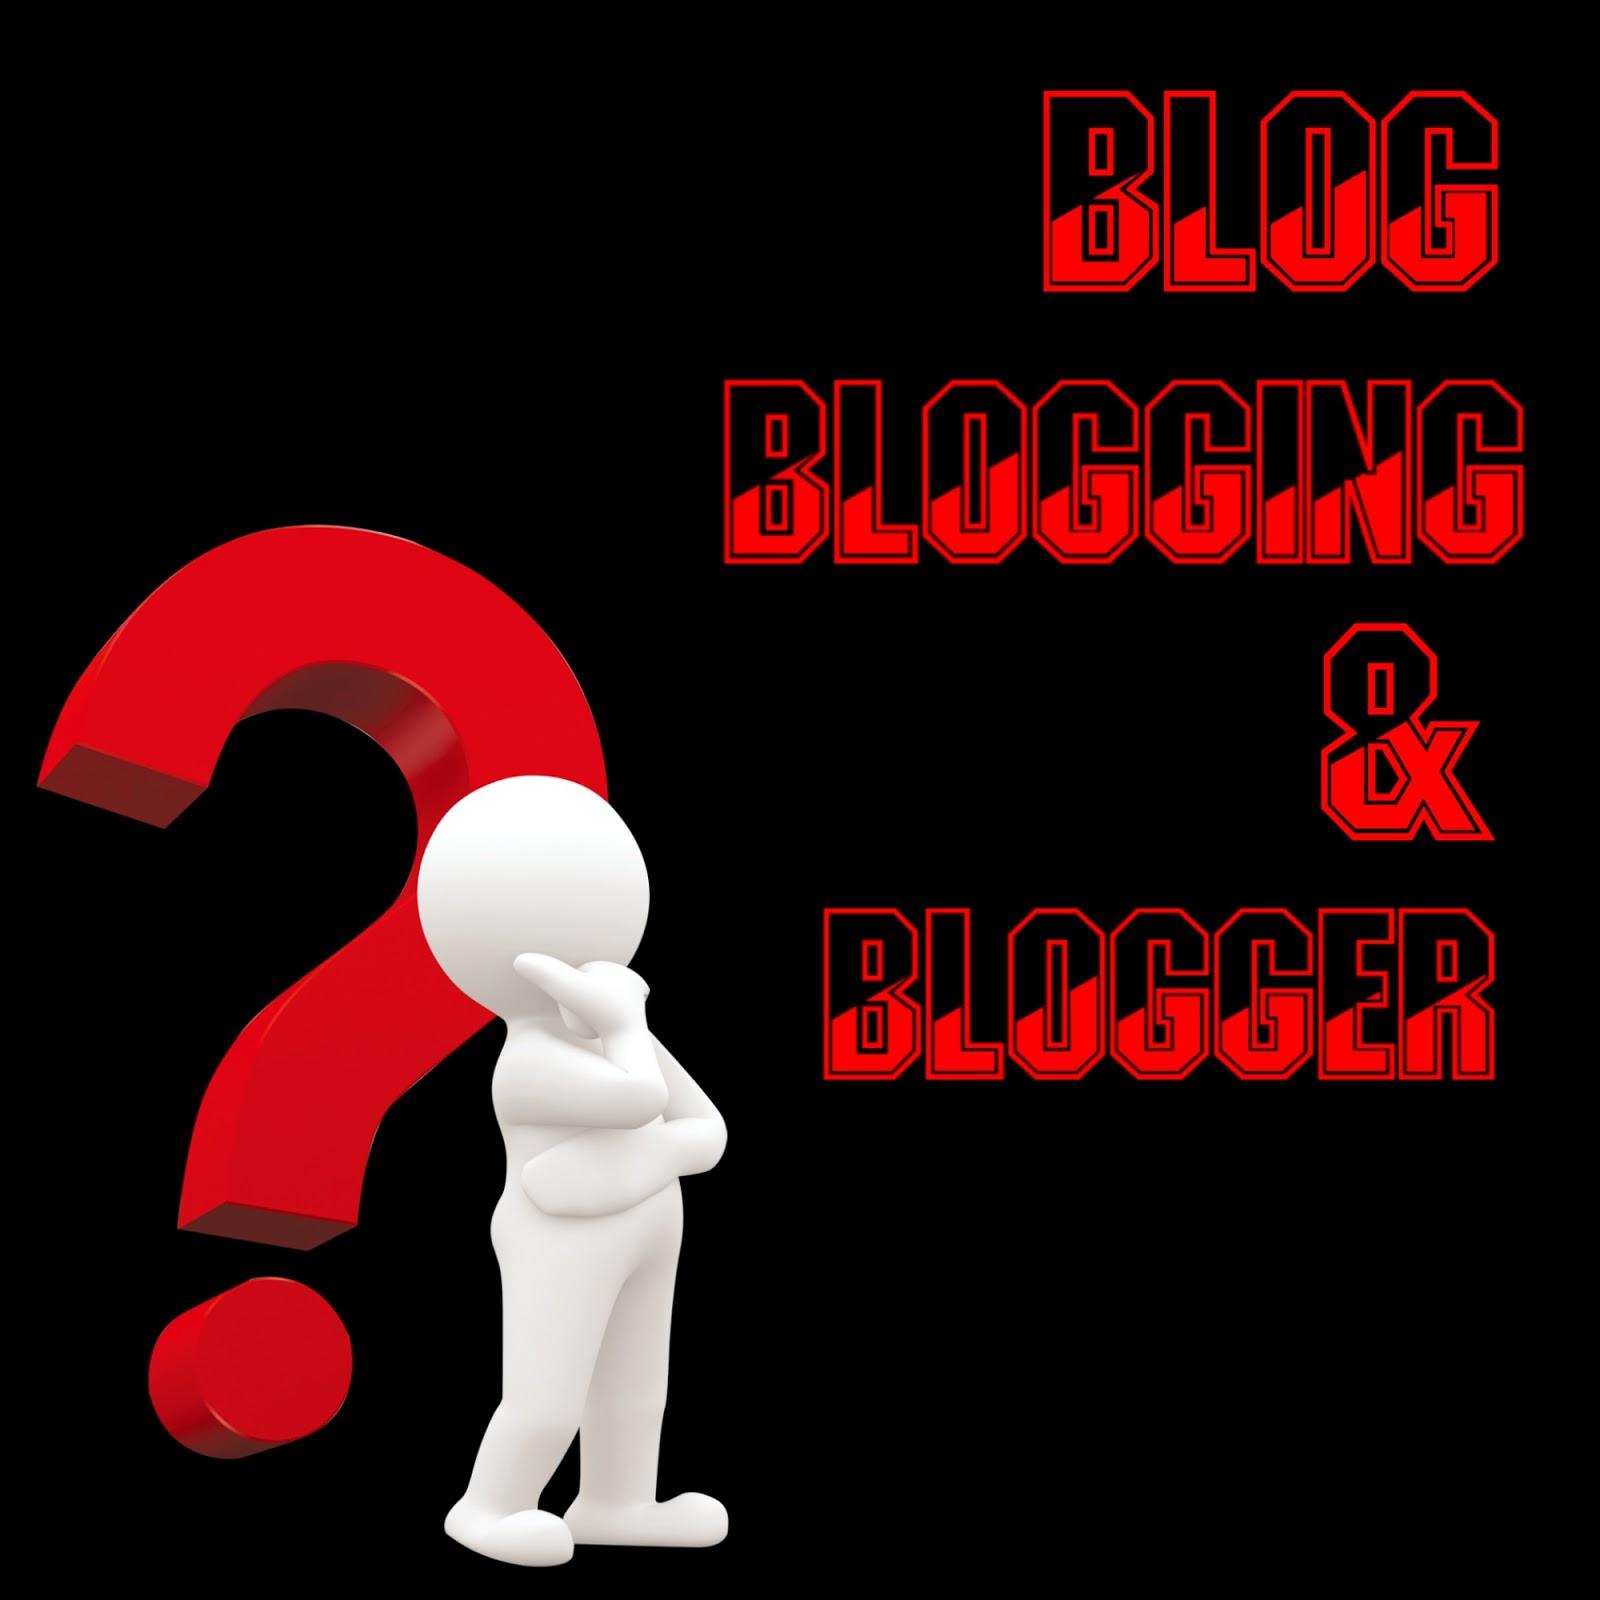 Blog-Blogging-and-Blogger